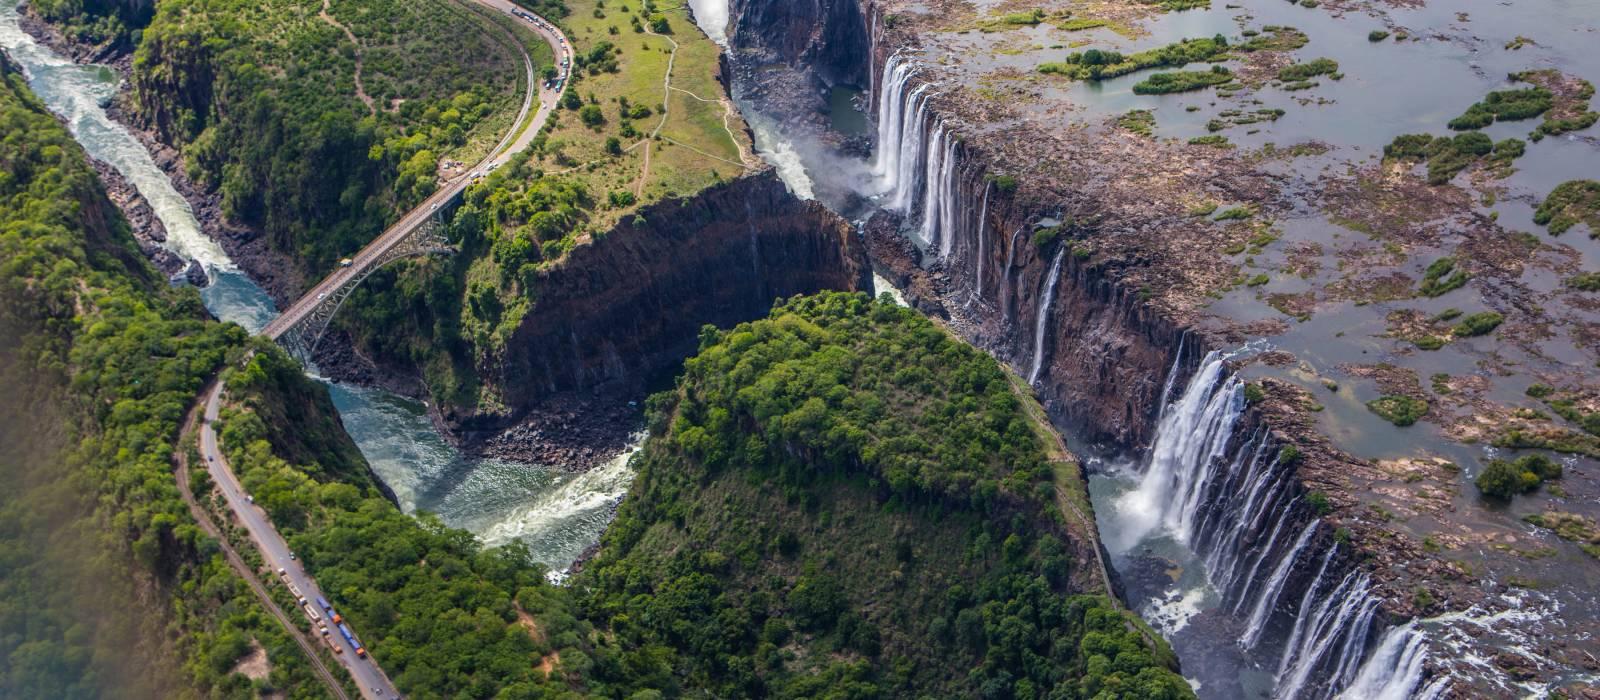 Victoria falls in Zimbabwe, Africa - Best time to visit Zimbabwe